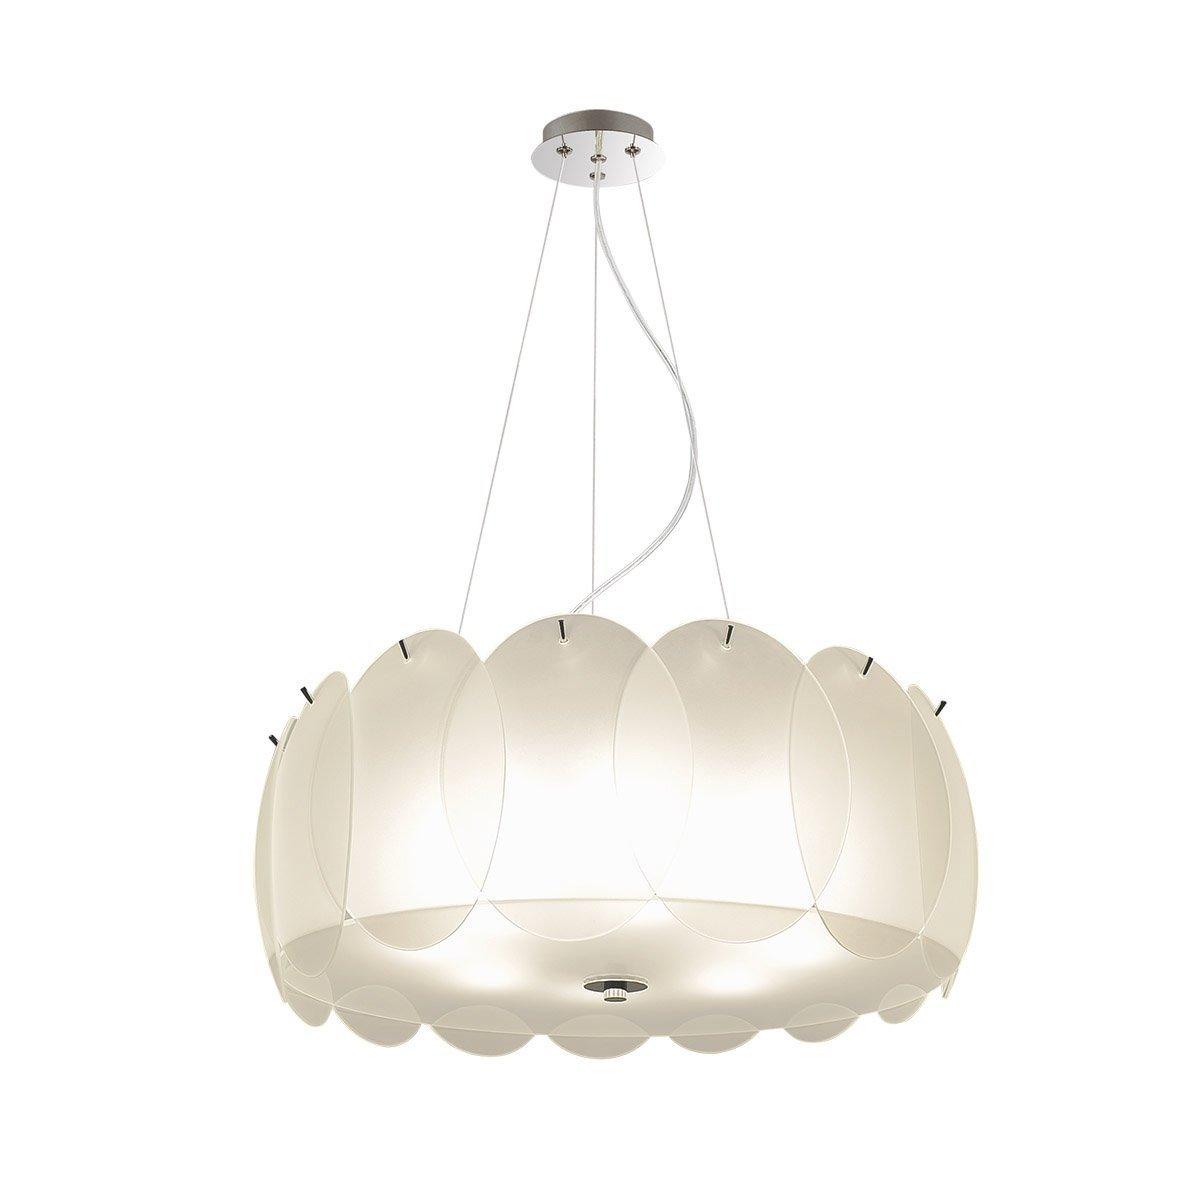 Lampa Wisząca Esseo Ma04143c 008 01